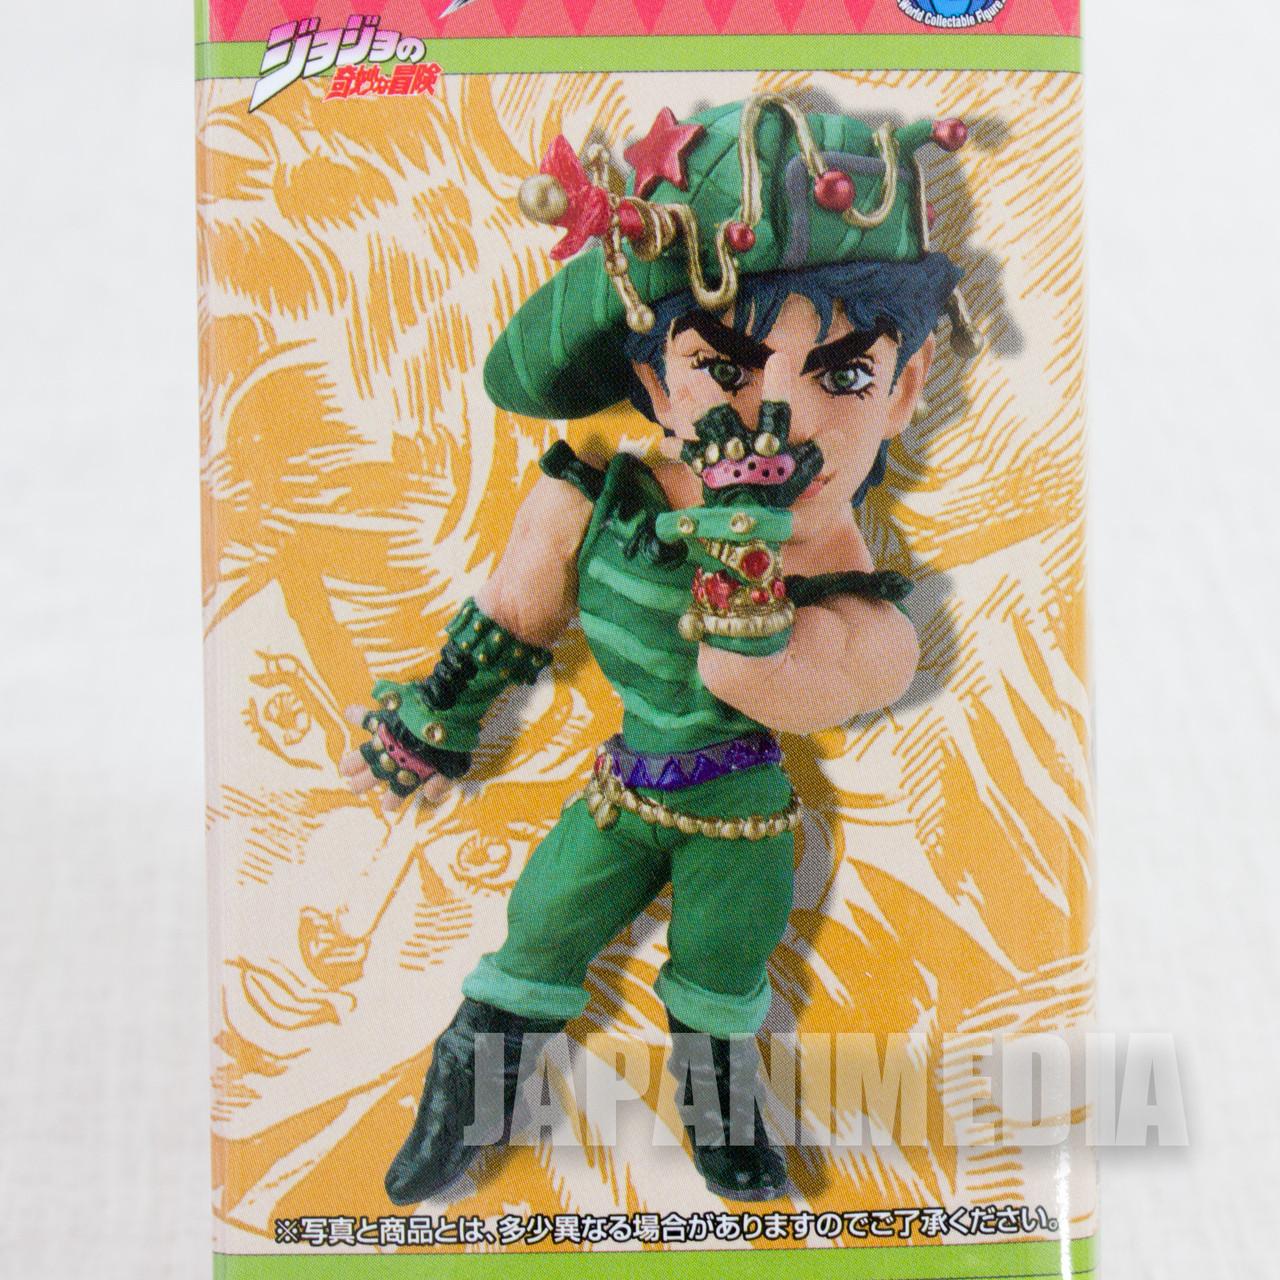 JoJo's Bizarre Adventure Jonathan Joestar World Collectable Figure Banpresto